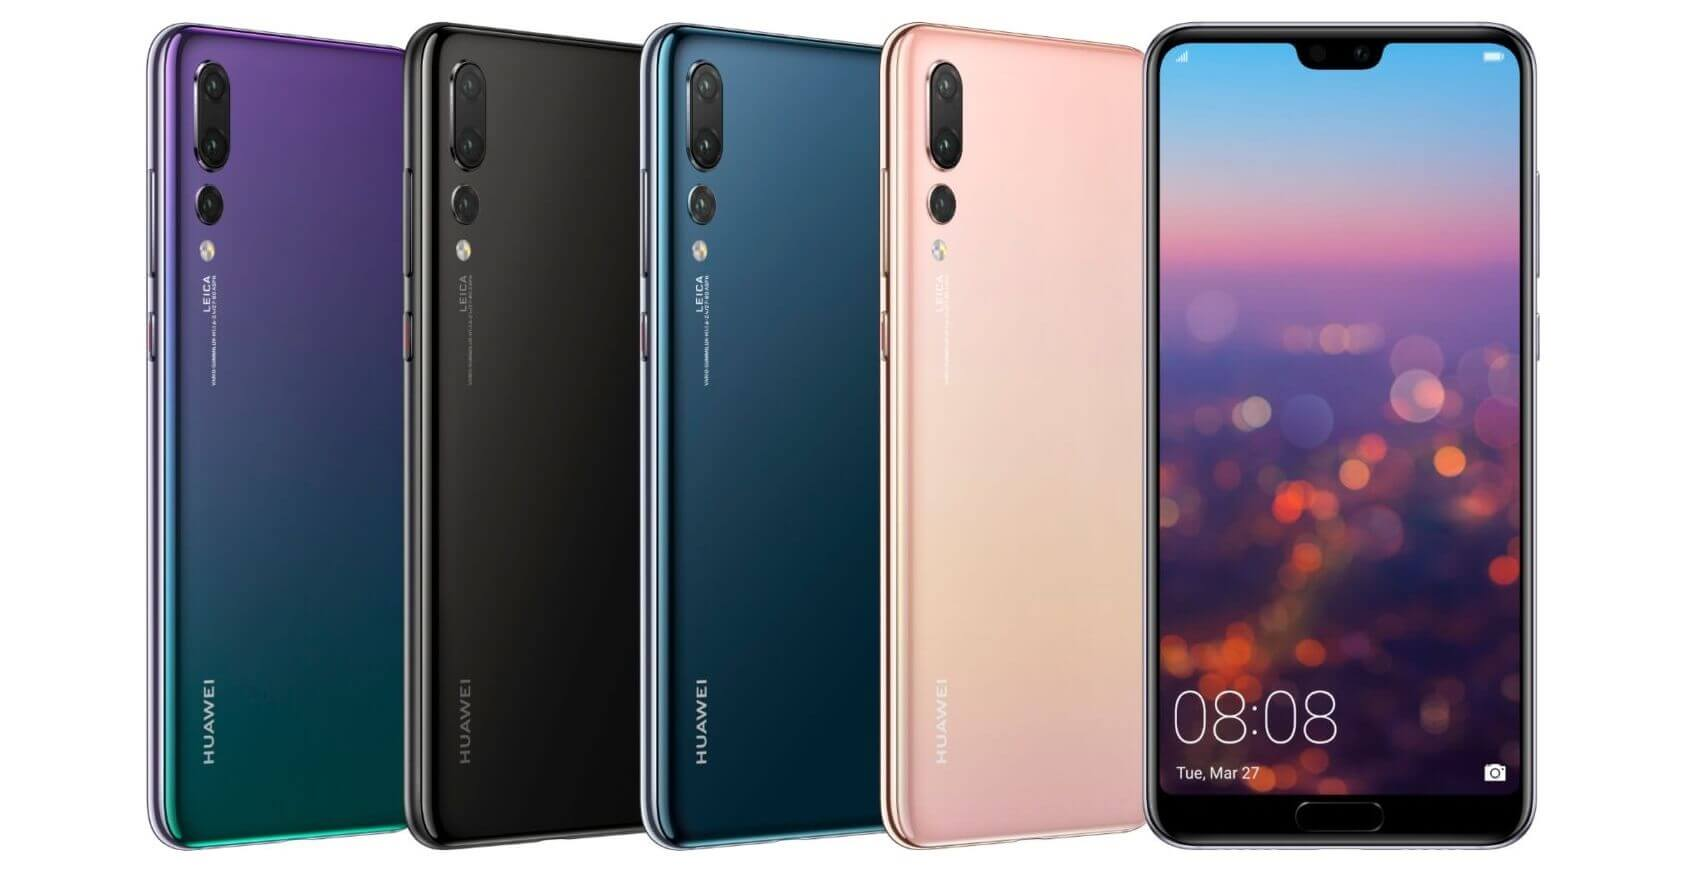 Bon plan : le Huawei P20 Pro passe à 733 euros sur Rakuten PriceMinster